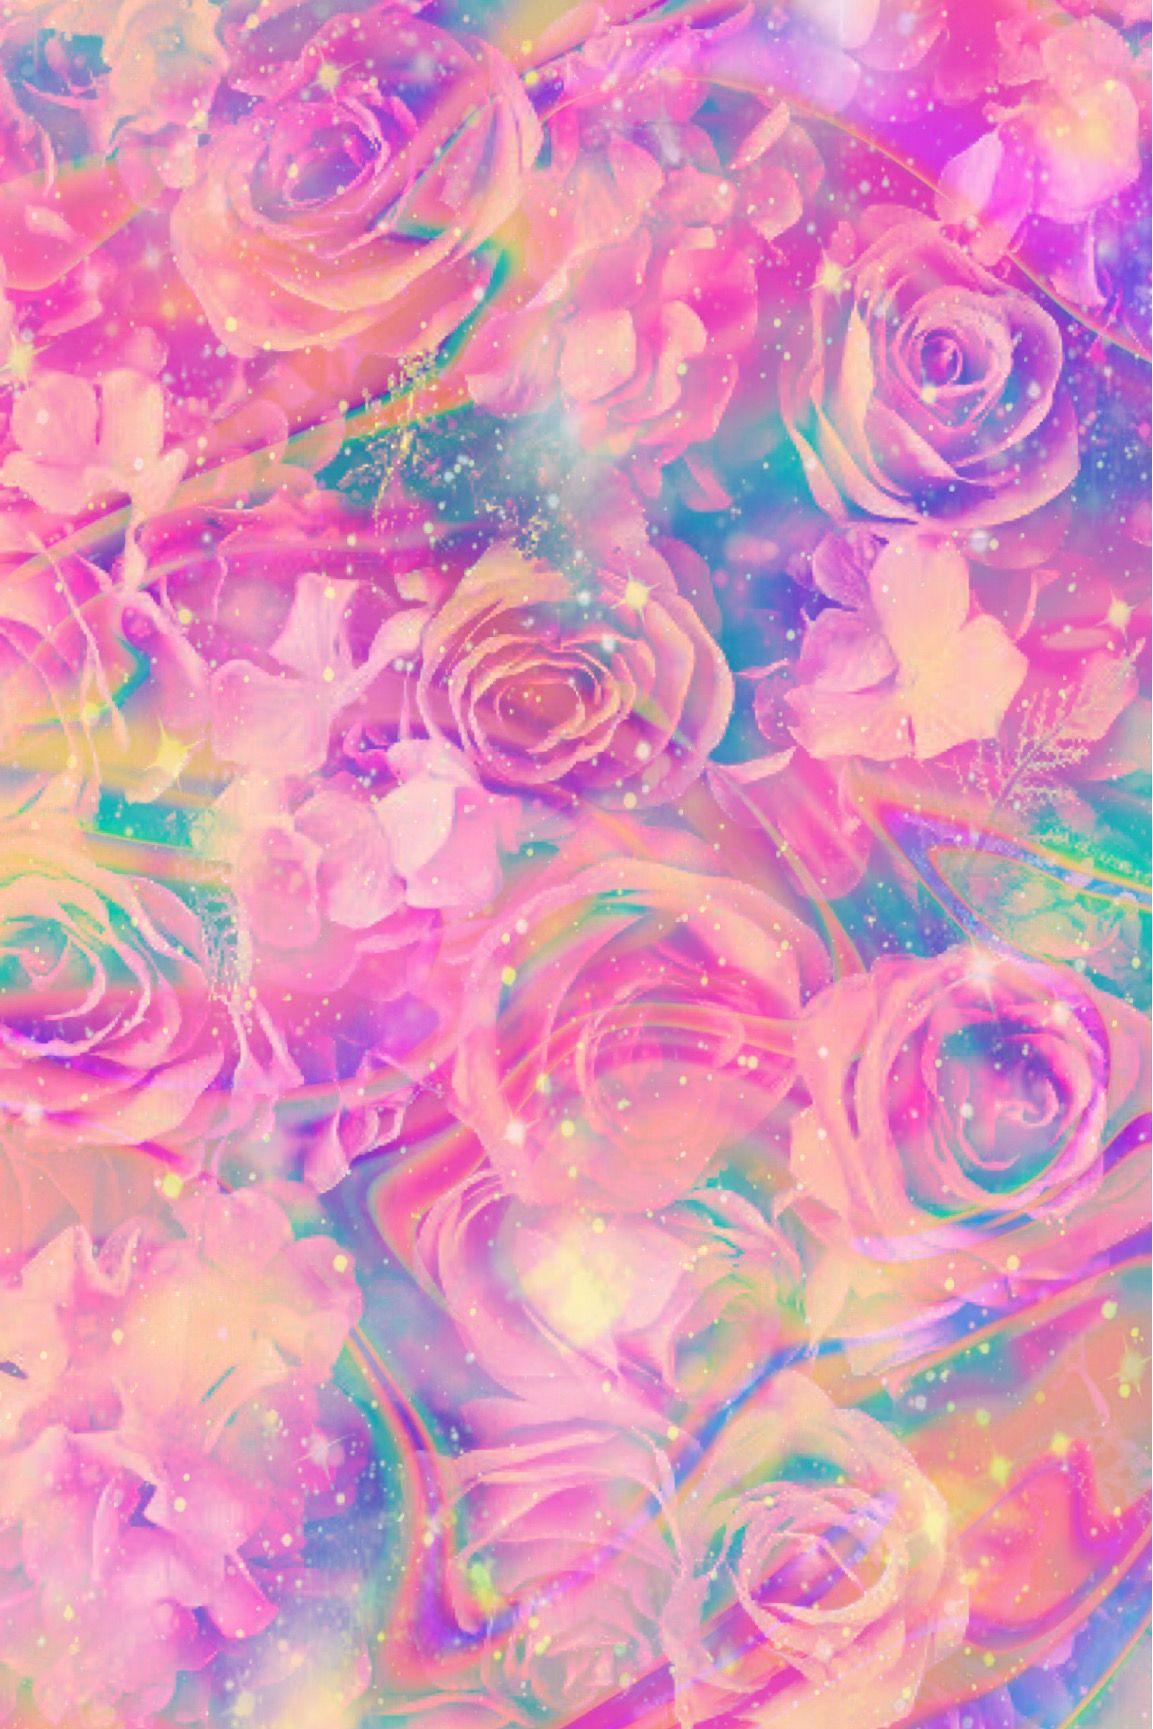 Rainbow Rose Water Galaxy Wallpaper Butterfly Wallpaper Iphone Sparkle Wallpaper Butterfly Wallpaper